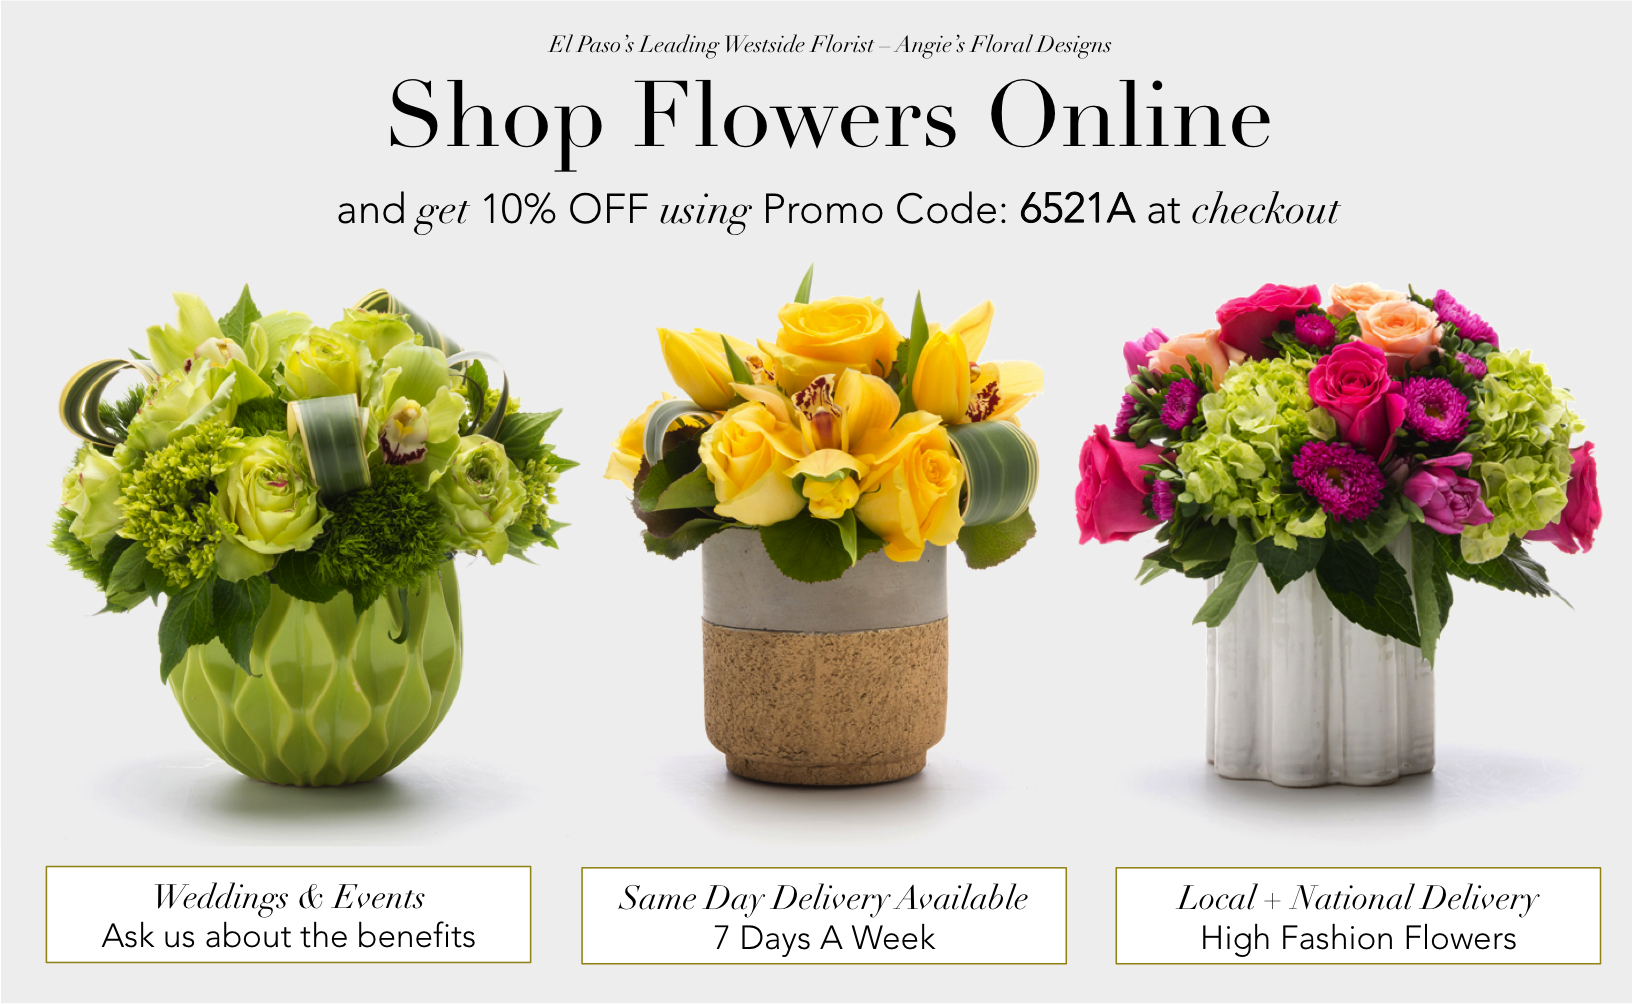 -angies-floral-designs-shop-online-el-paso-texas-florist-flower-delivery-weddings-events-79912.png